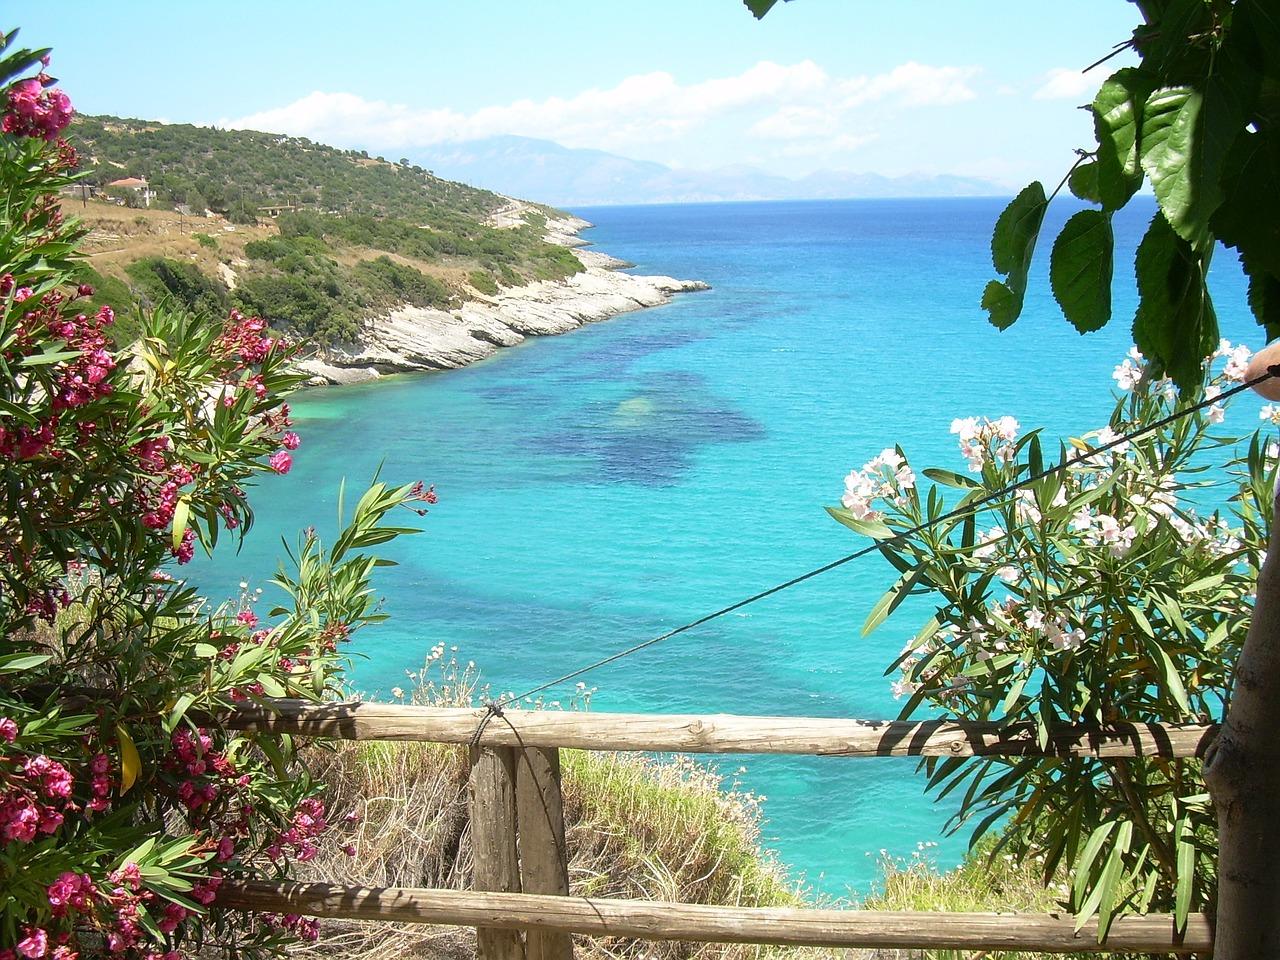 Zakynthos - Greece's Emerald Isle